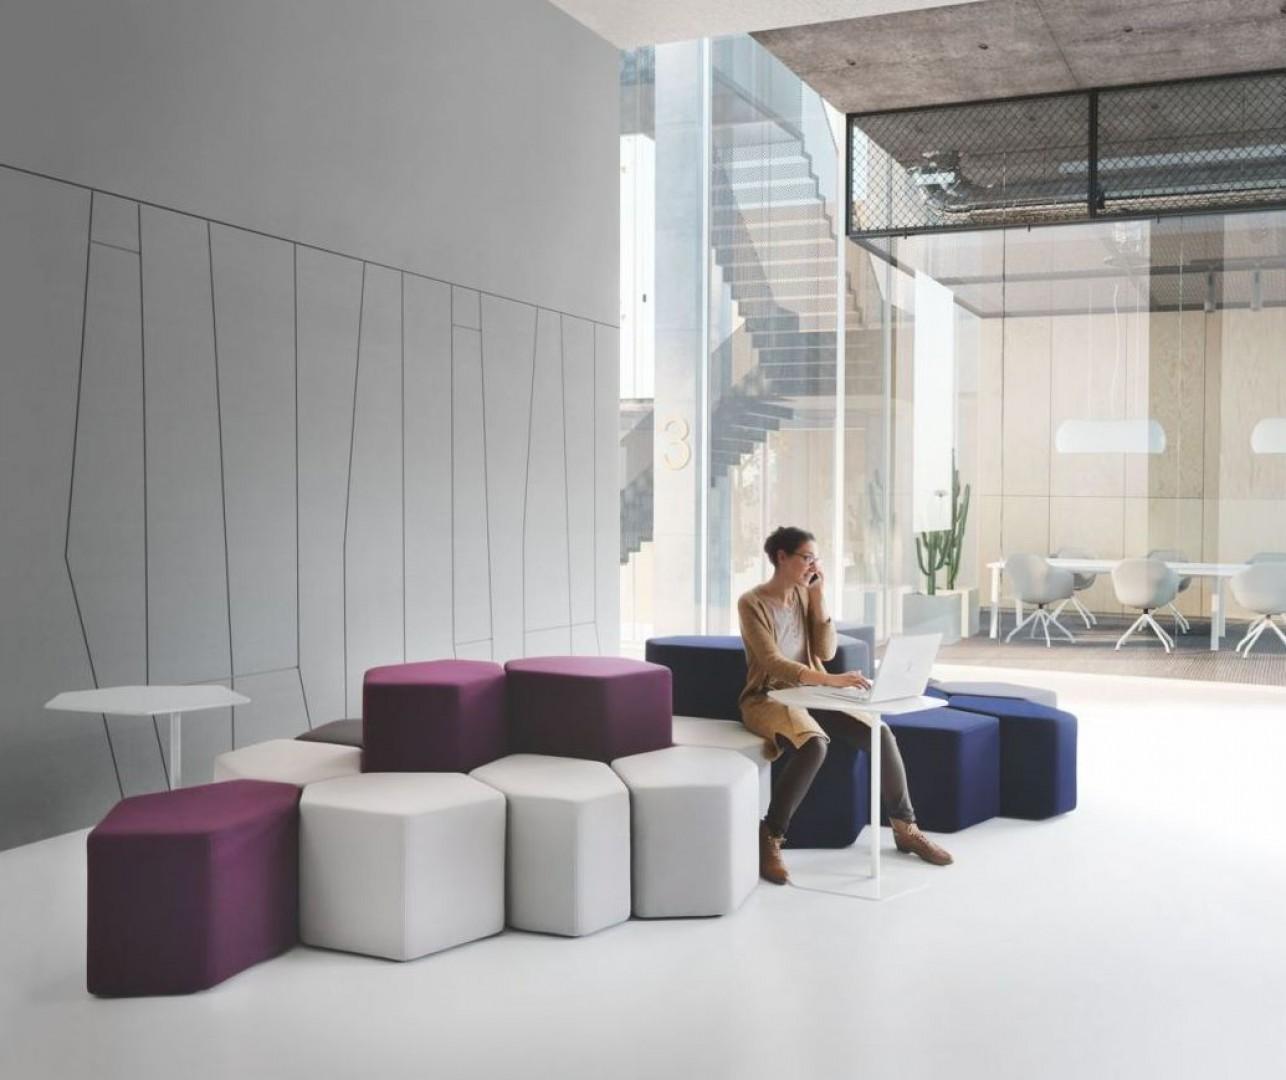 Siedziska typu sof seating Bazalto z oferty firmy MDD. Projekt: Andreas Krob. Fot. MDD